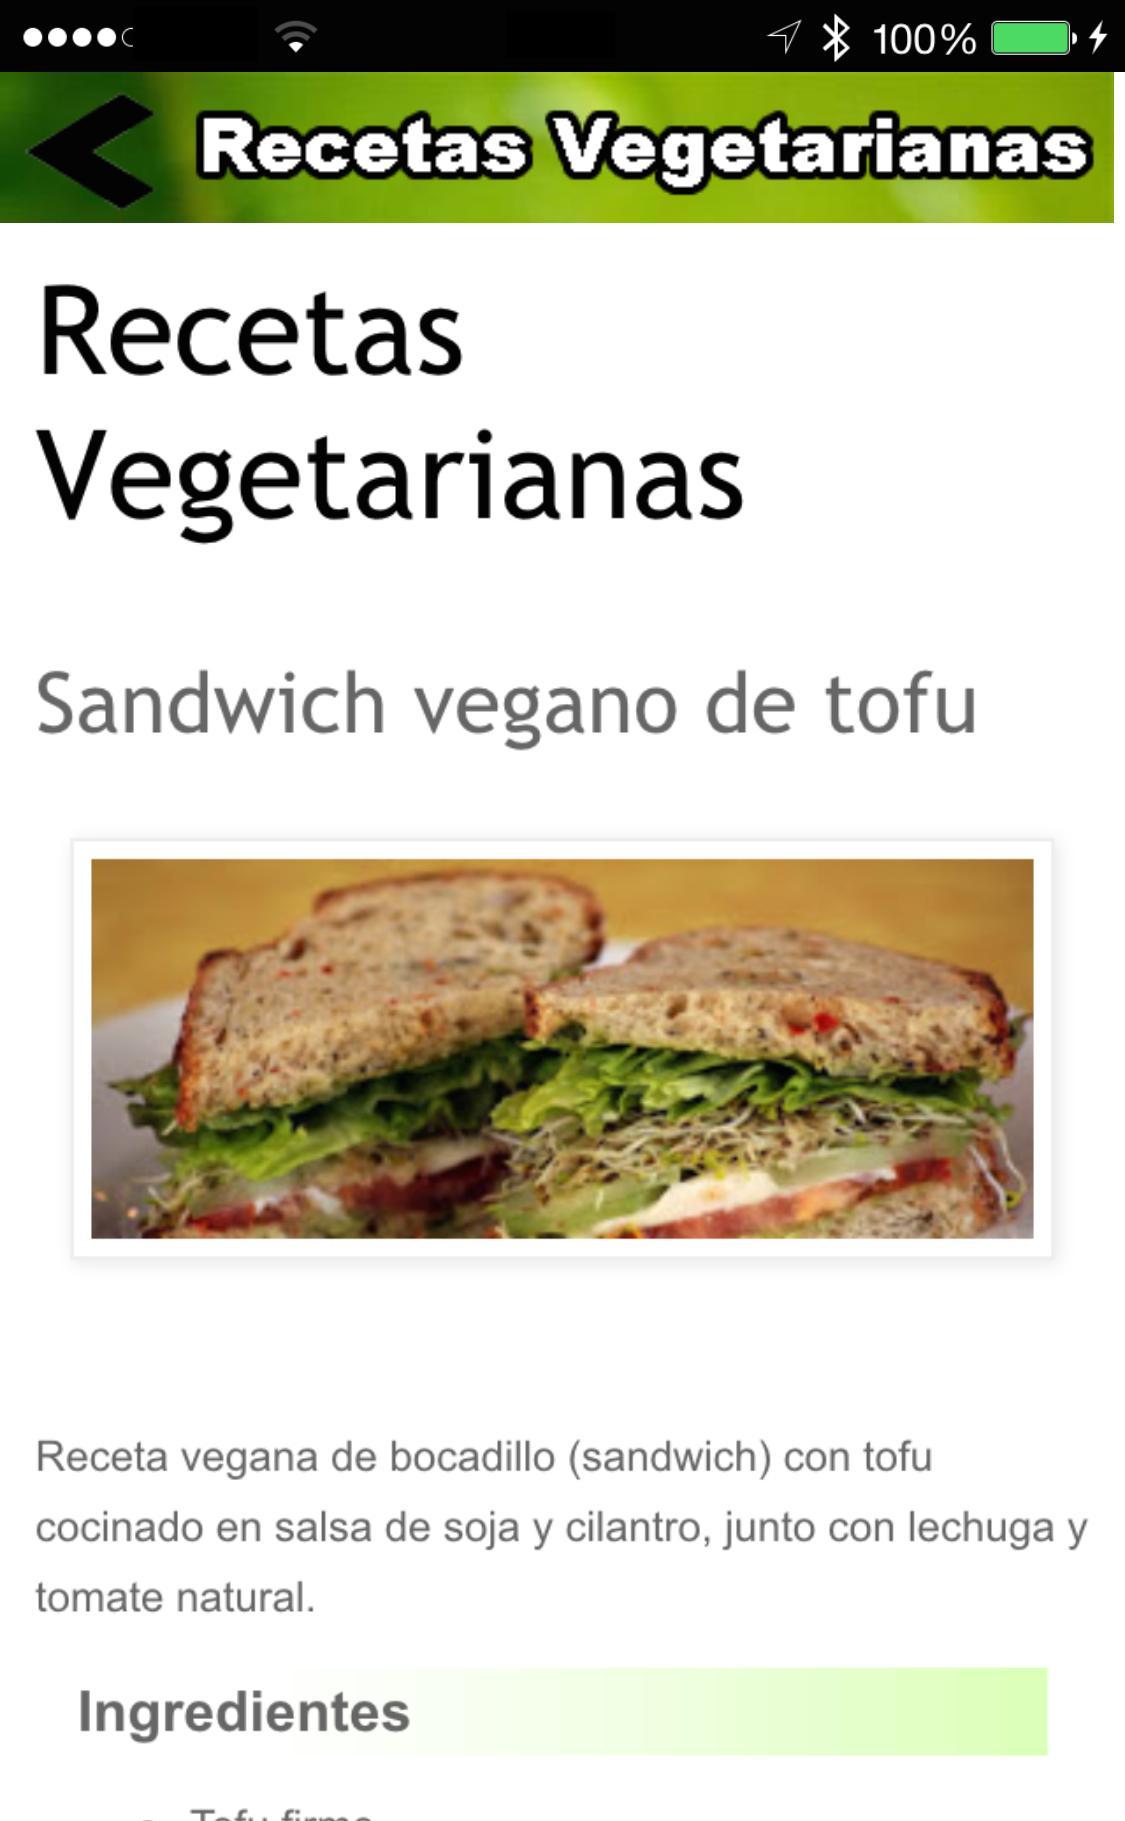 Recetas Vegetarianas For Android Apk Download